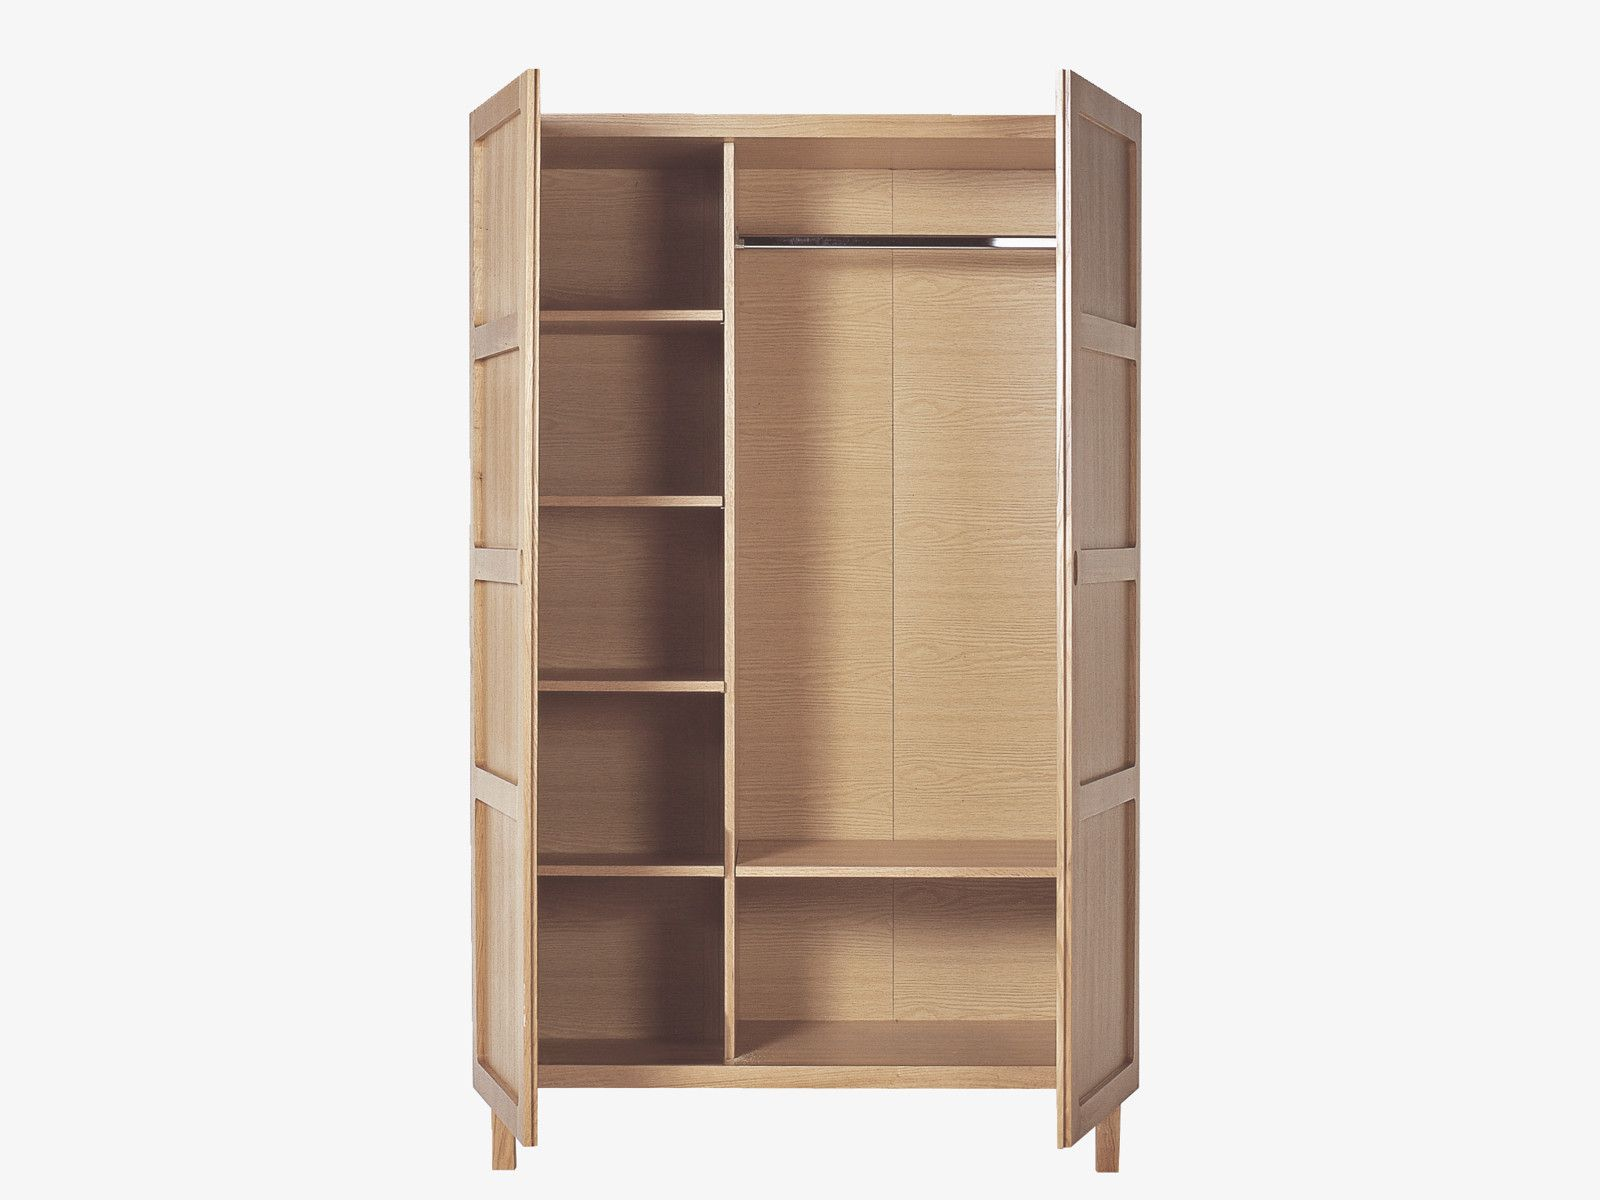 Radius Oak 2 Door Wardrobe With Hanging Rail And 5 Shelves 2 Door Wardrobe Shelves Hanging Rail